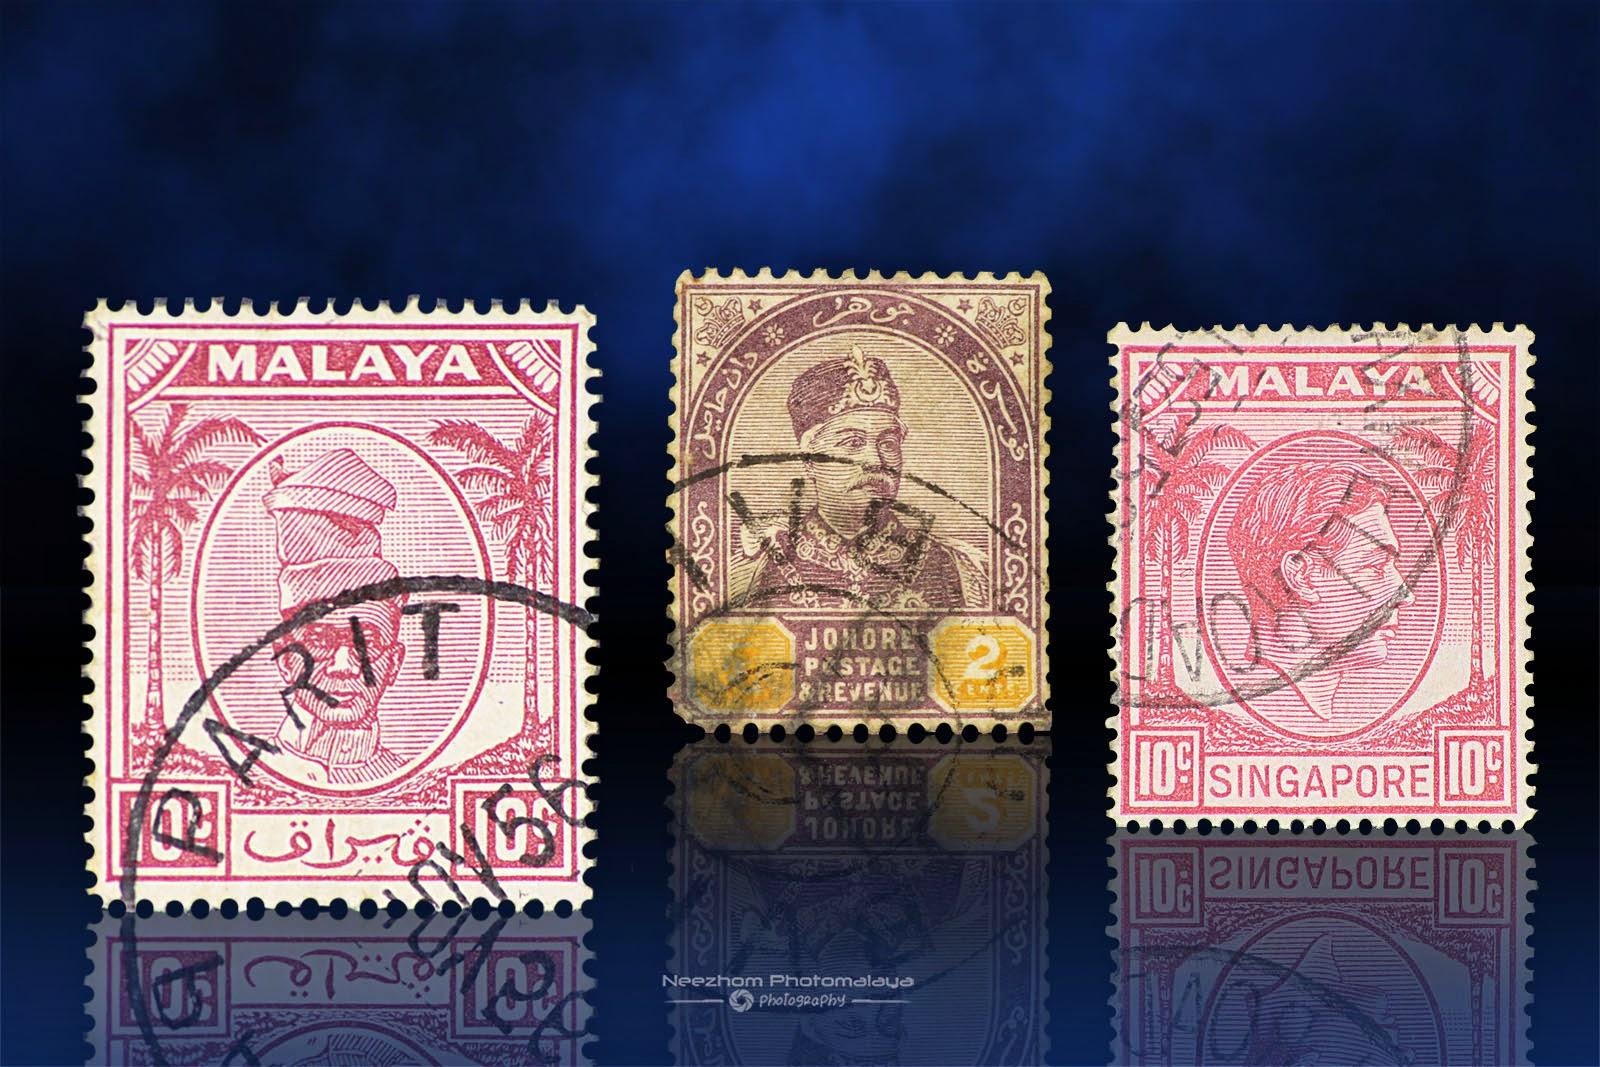 Setem Malaya